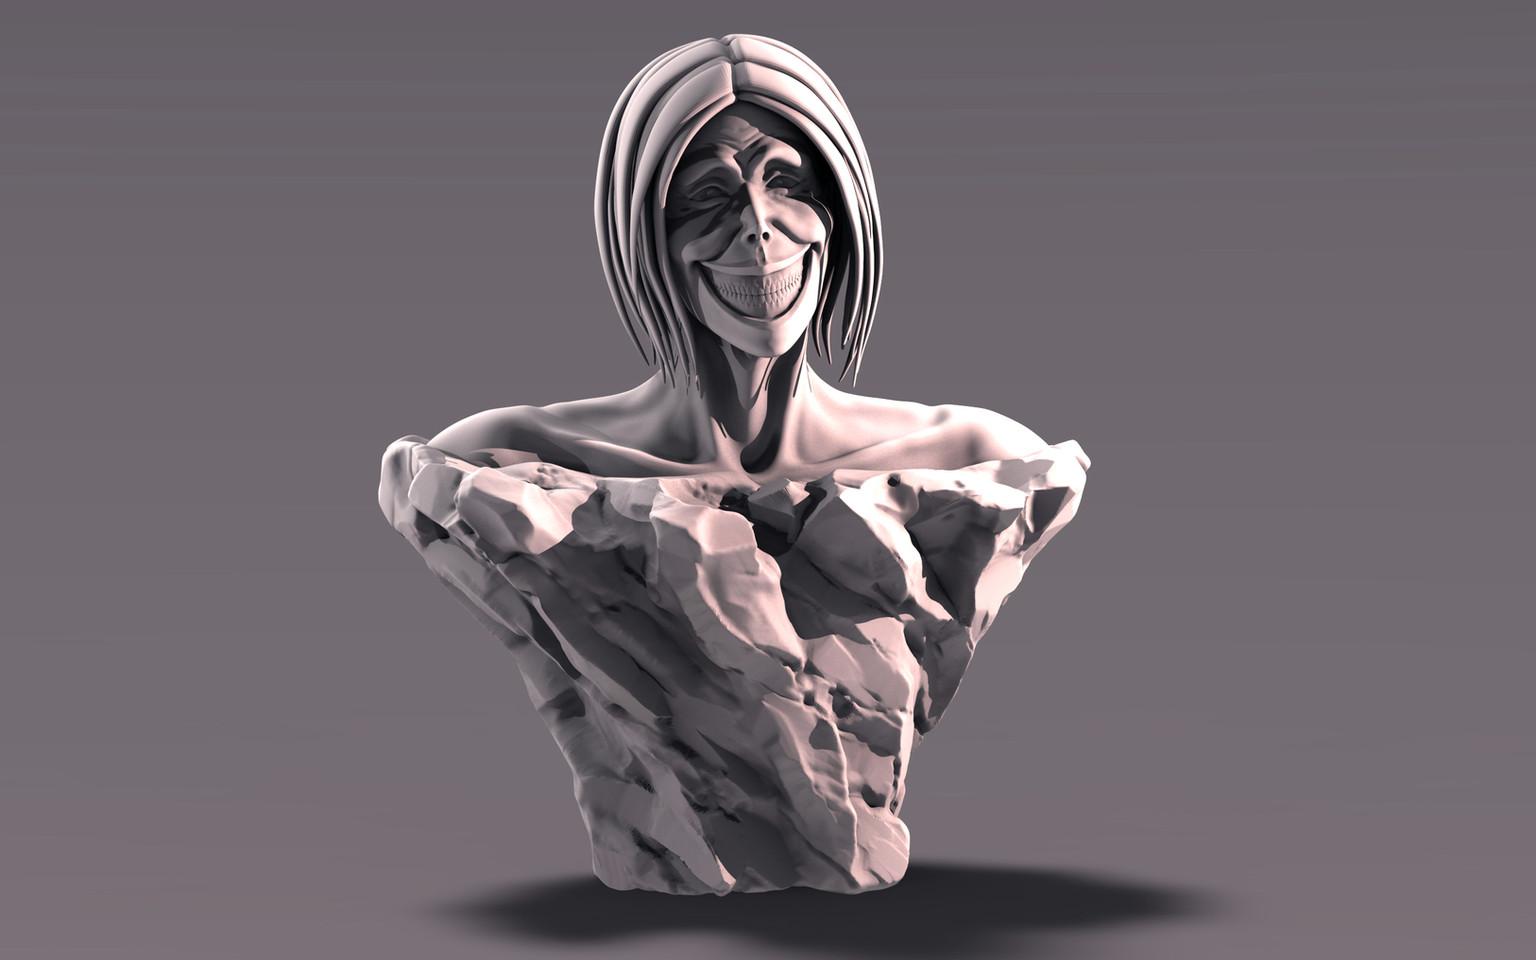 Smiling Titan Bust